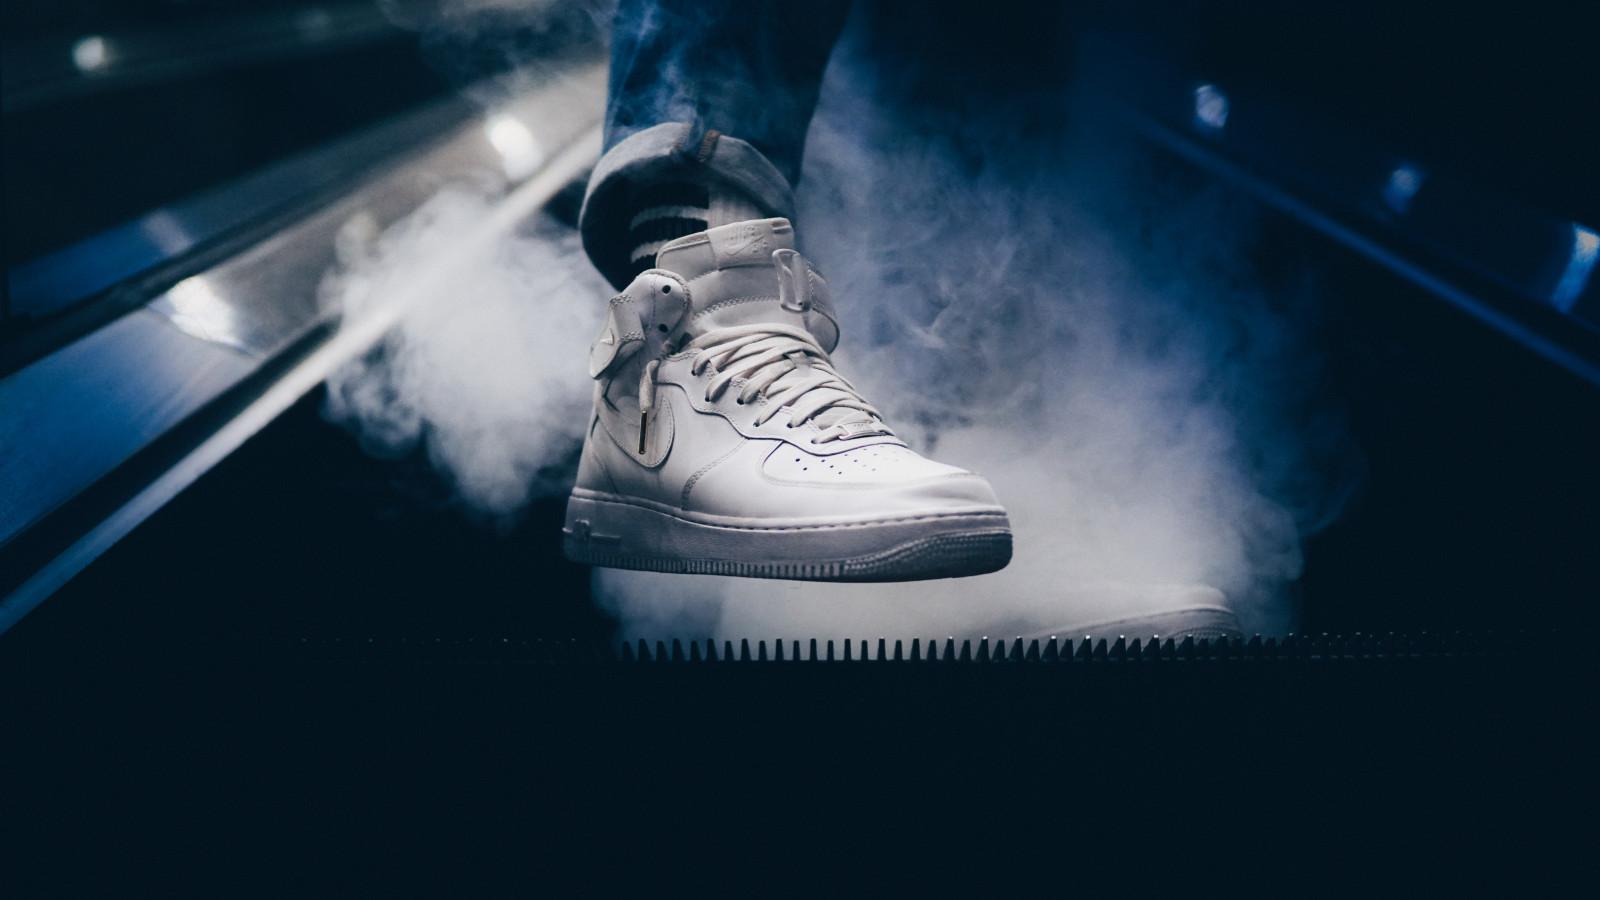 Fond D écran Sneaker Pied Fumée 6000x3376